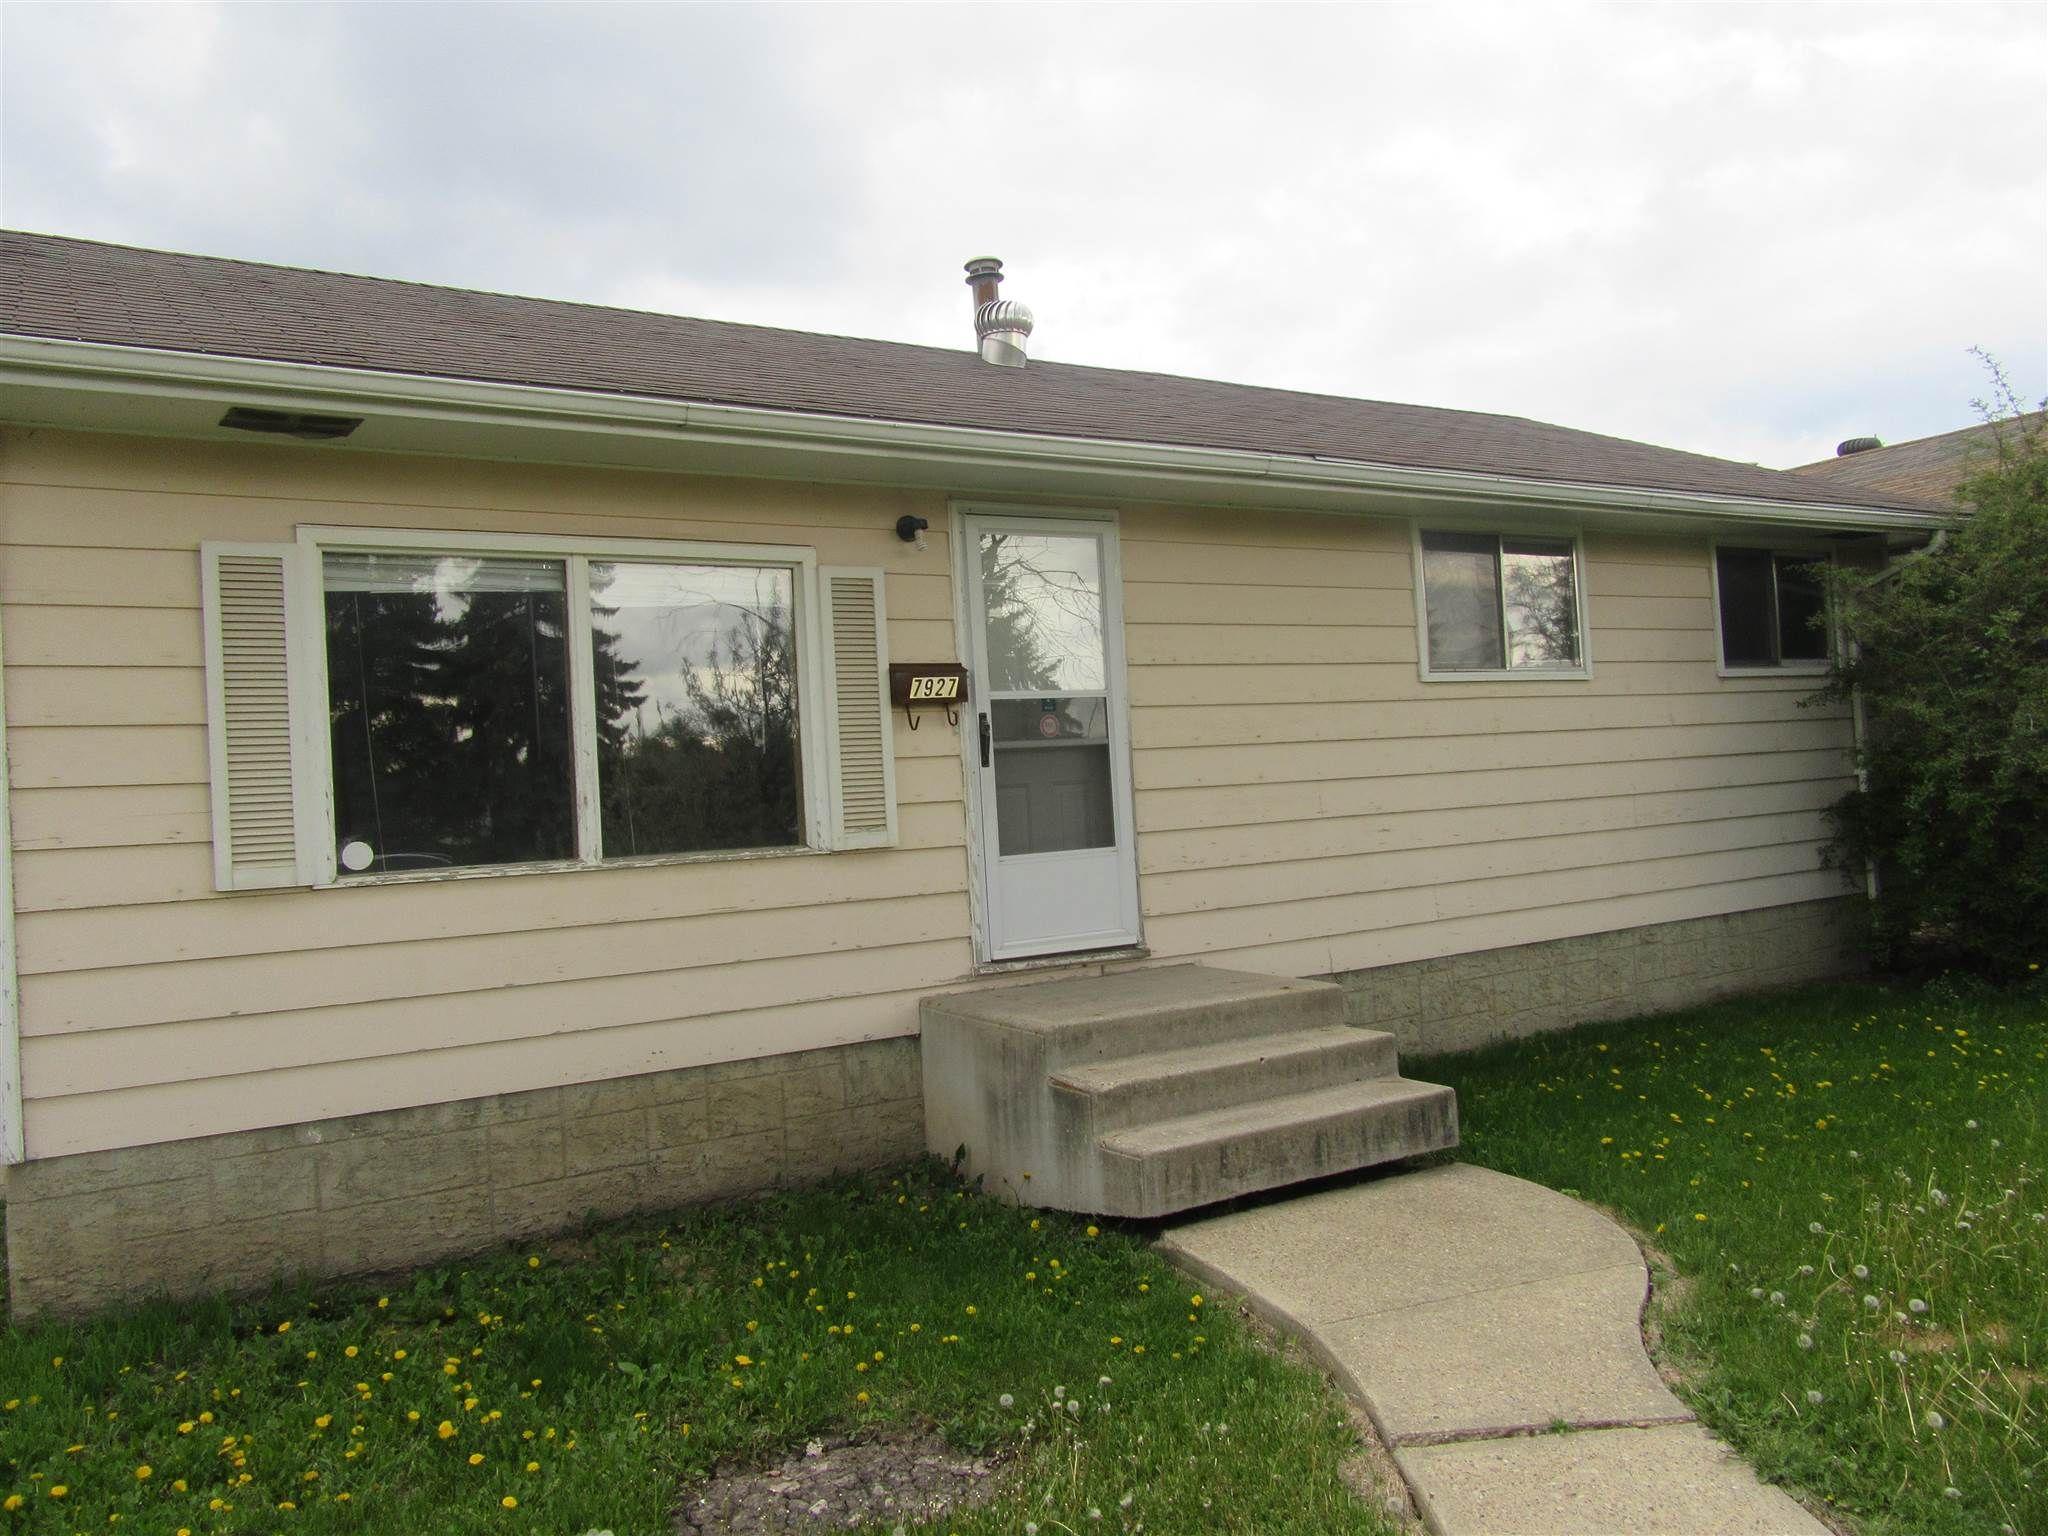 Main Photo: 7927 131A Avenue in Edmonton: Zone 02 House for sale : MLS®# E4248705